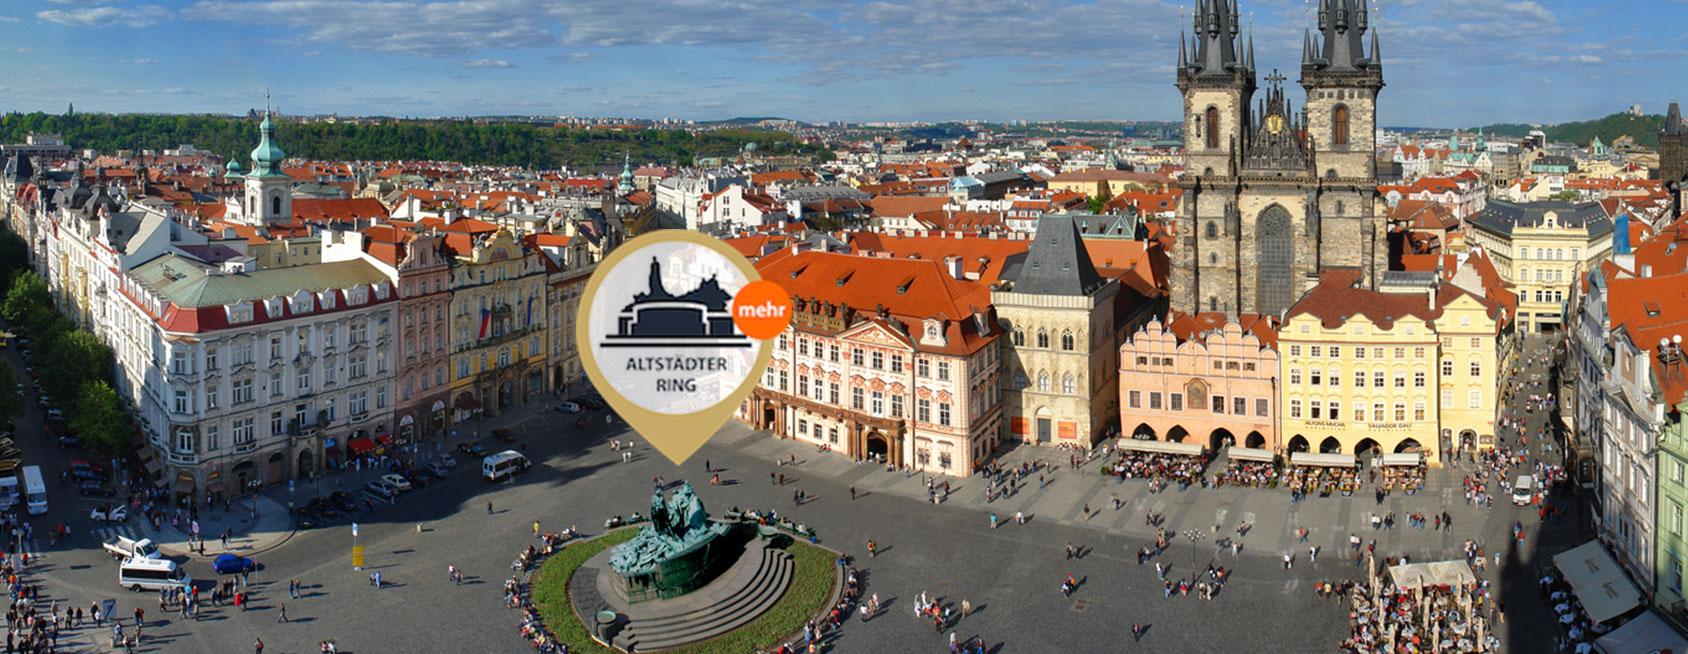 Altstaedter-Ring-Prag